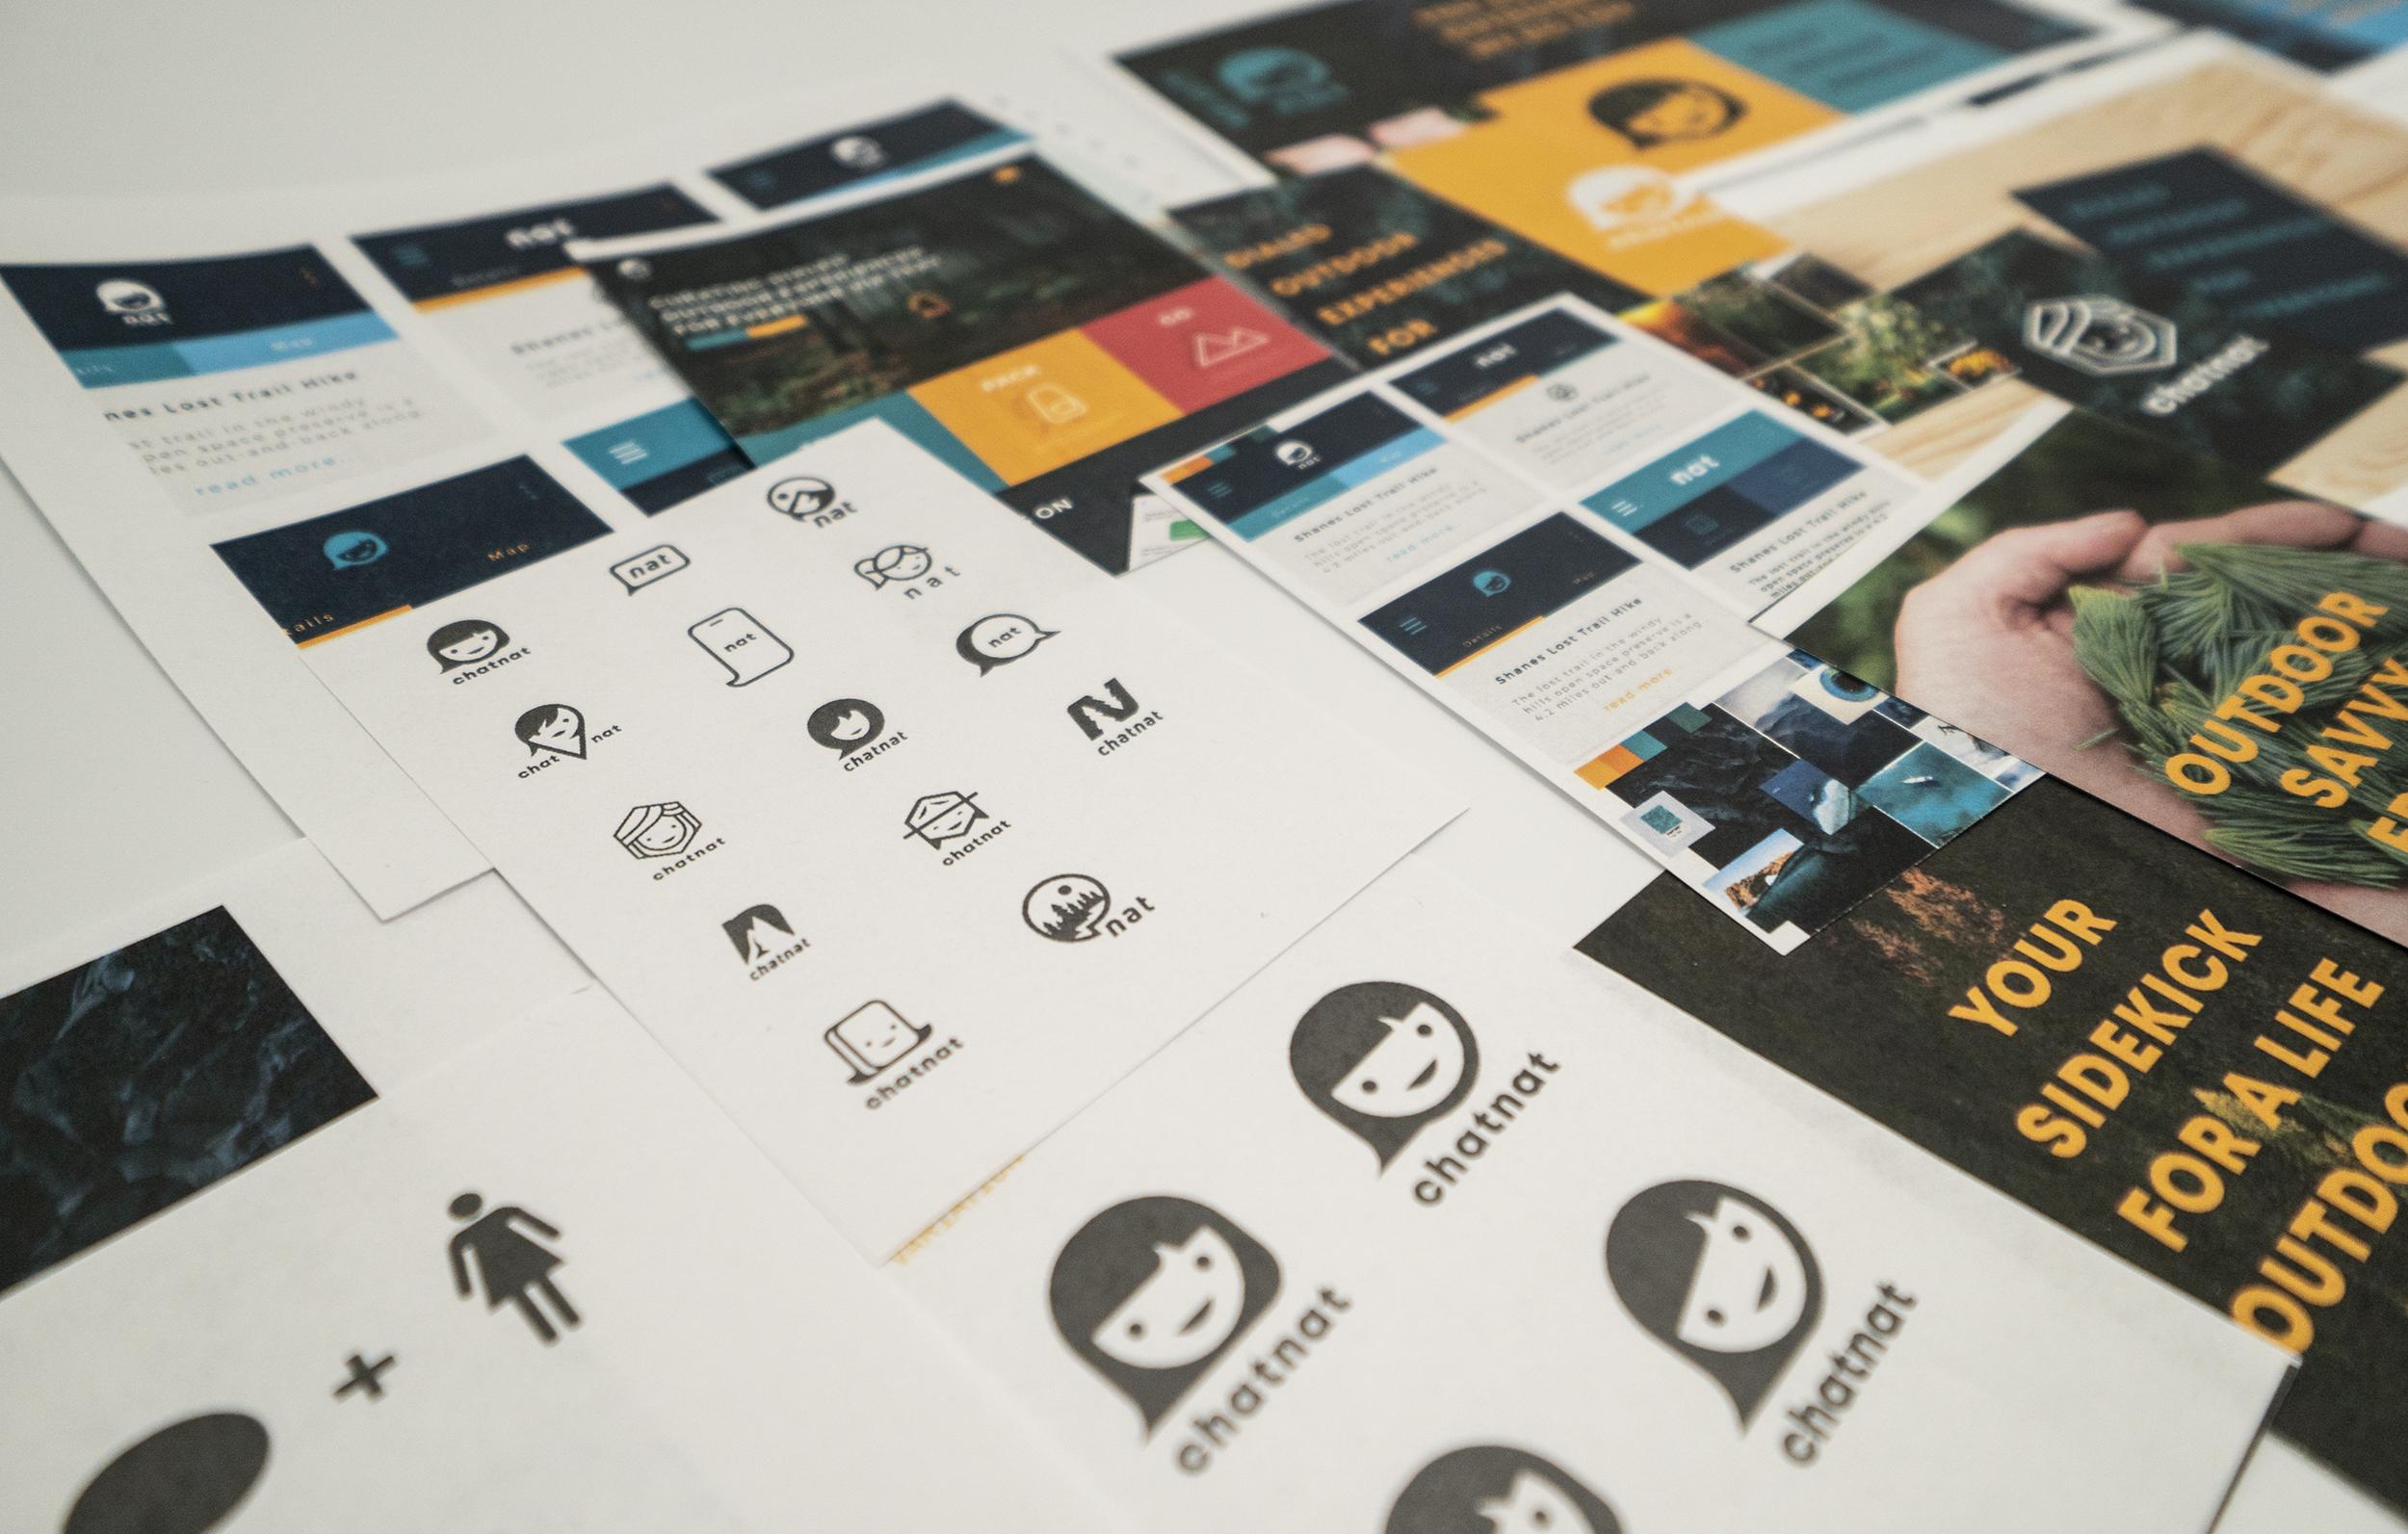 chat-nat-creative-session-branding-process-slides.jpg